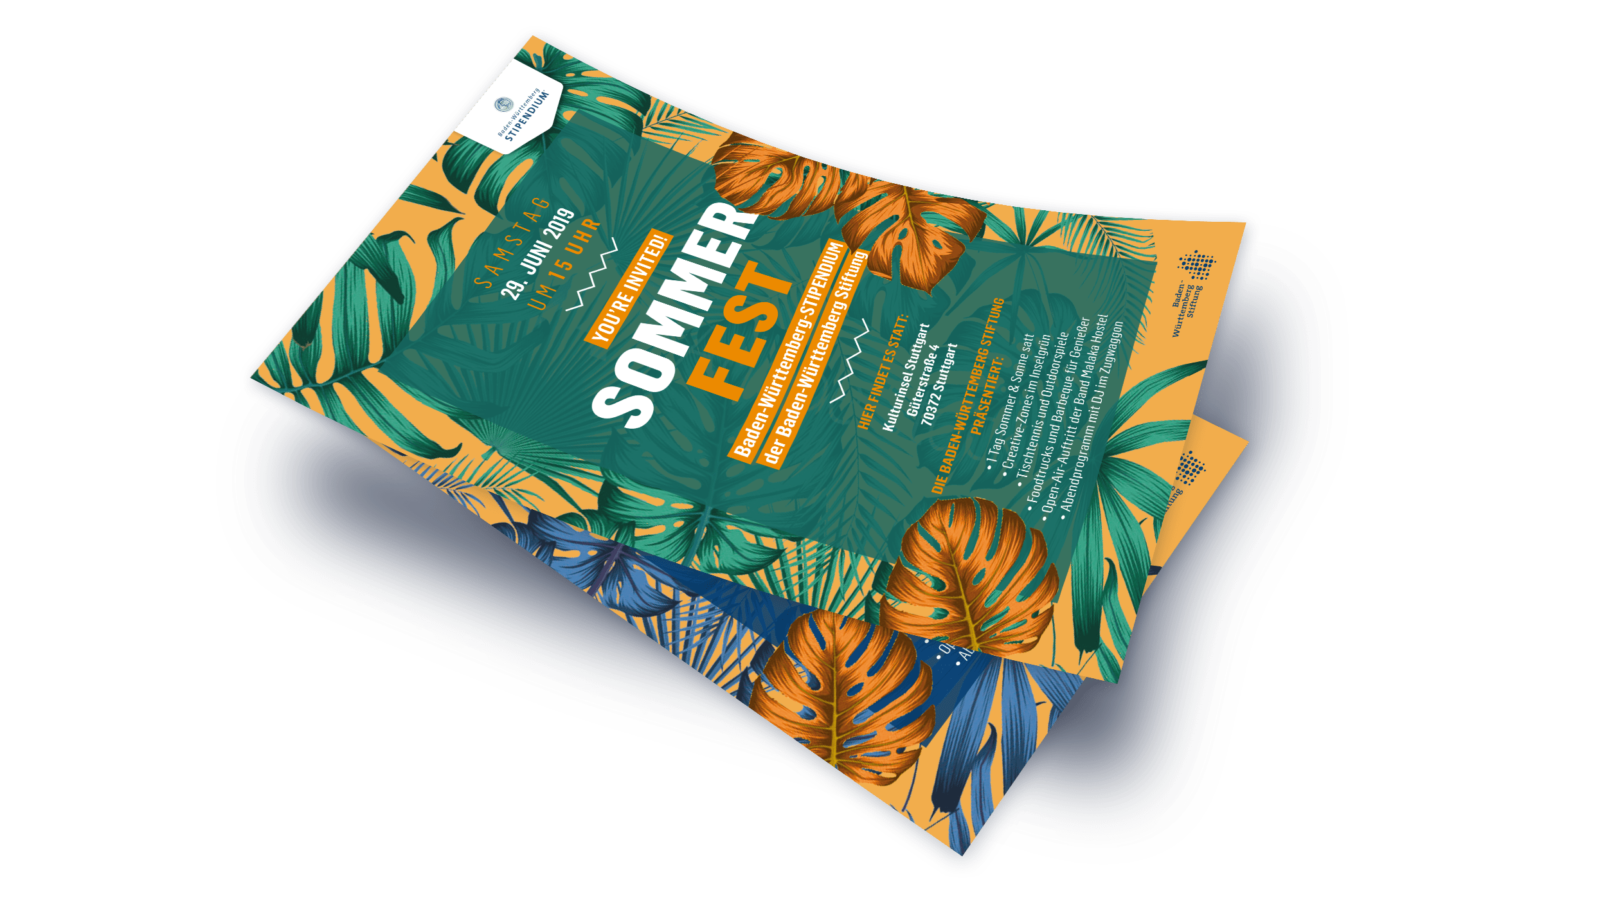 BWS Sommerfest Einladung Mockup